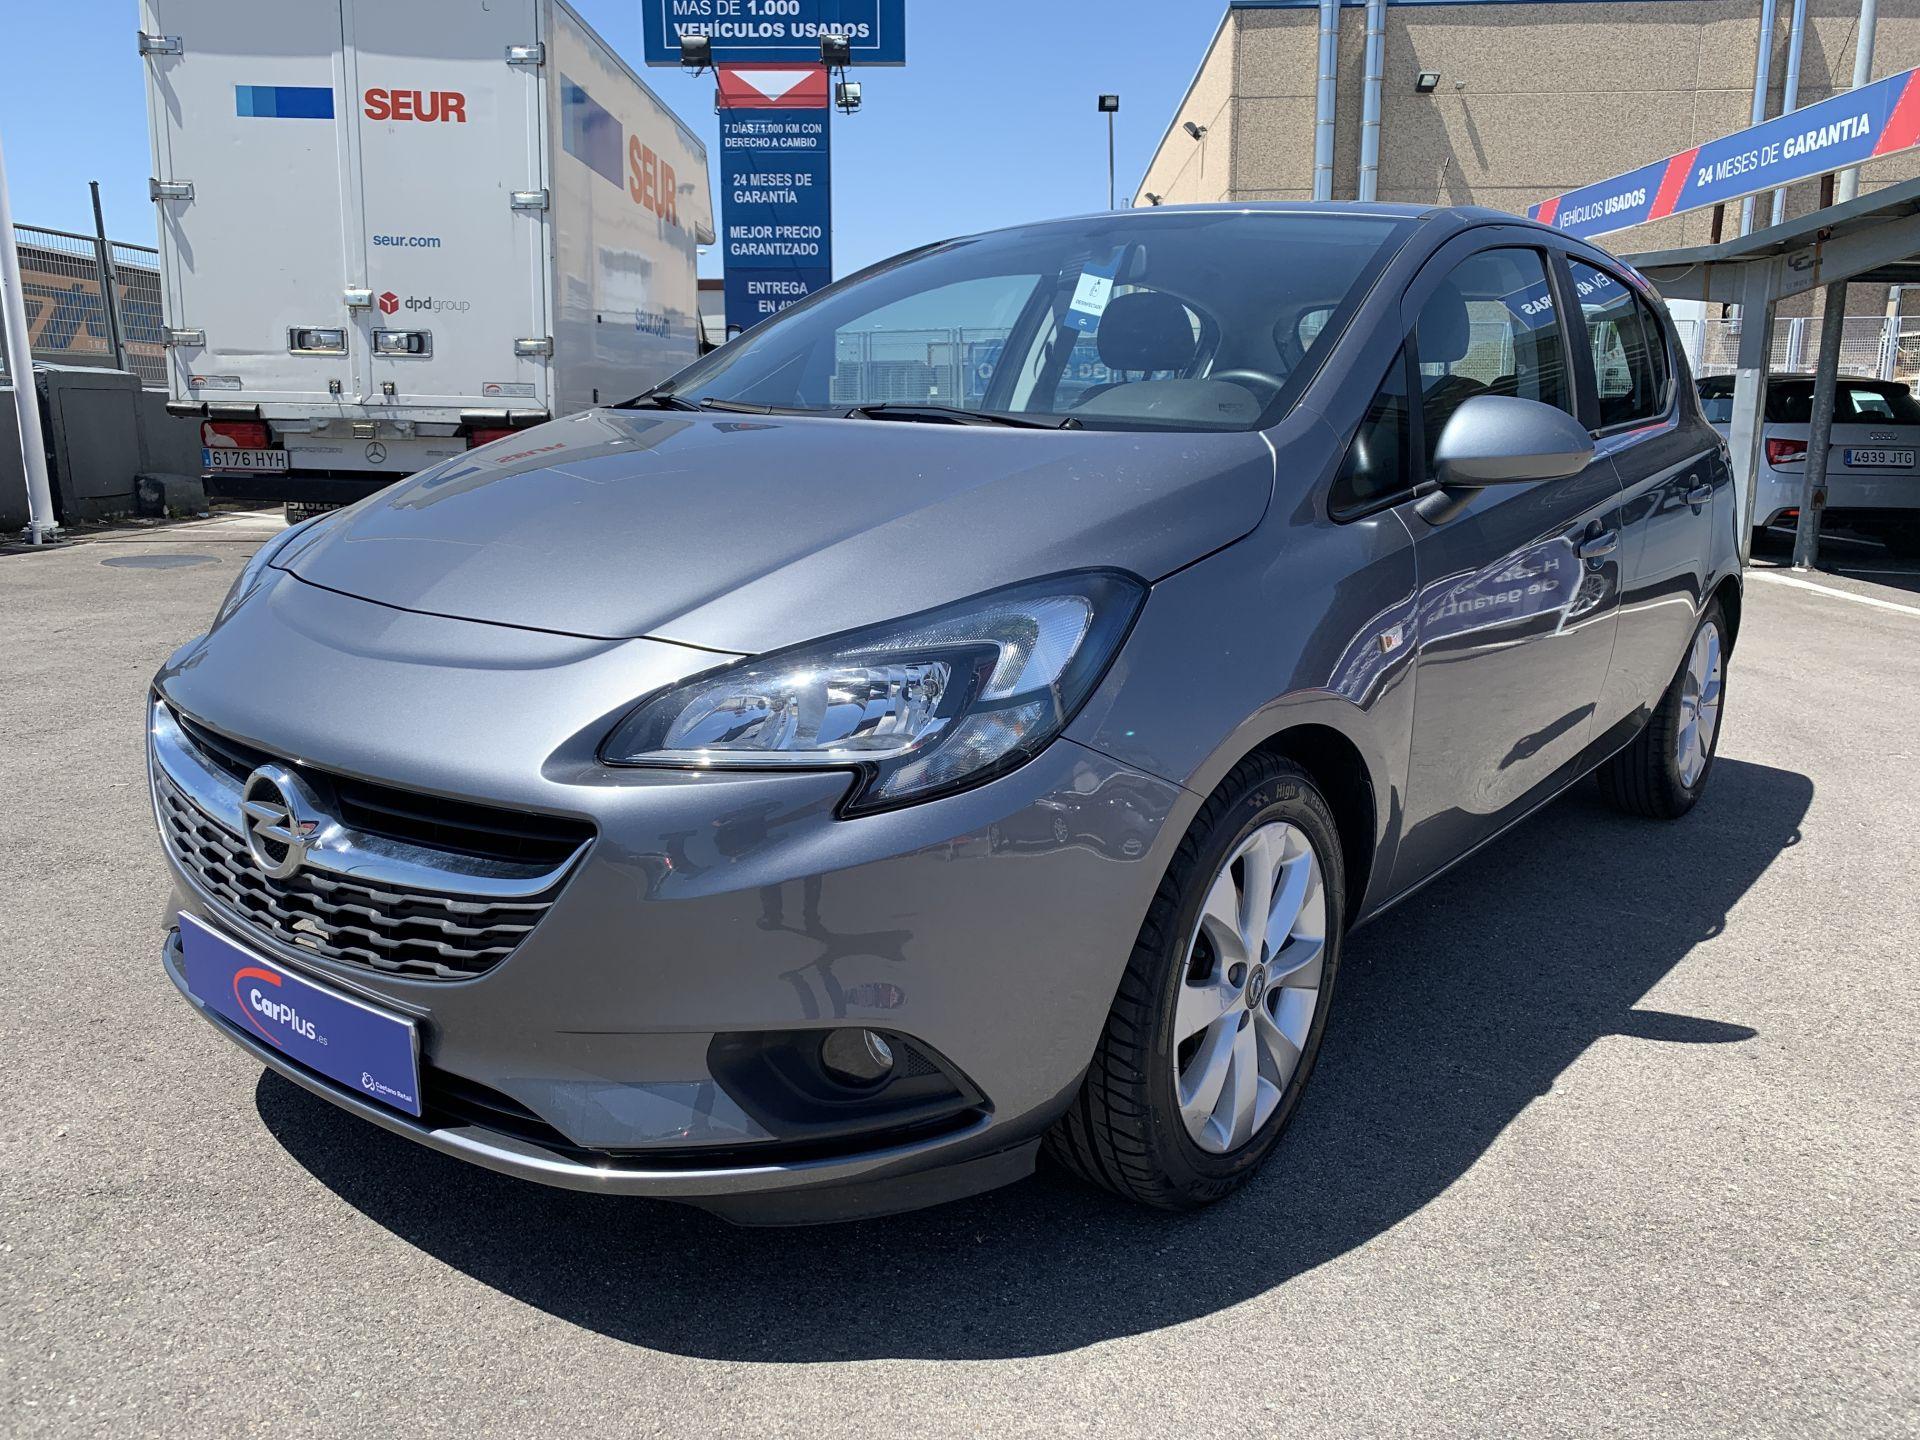 Opel Corsa 1.4 66kW (90CV) Selective segunda mano Madrid